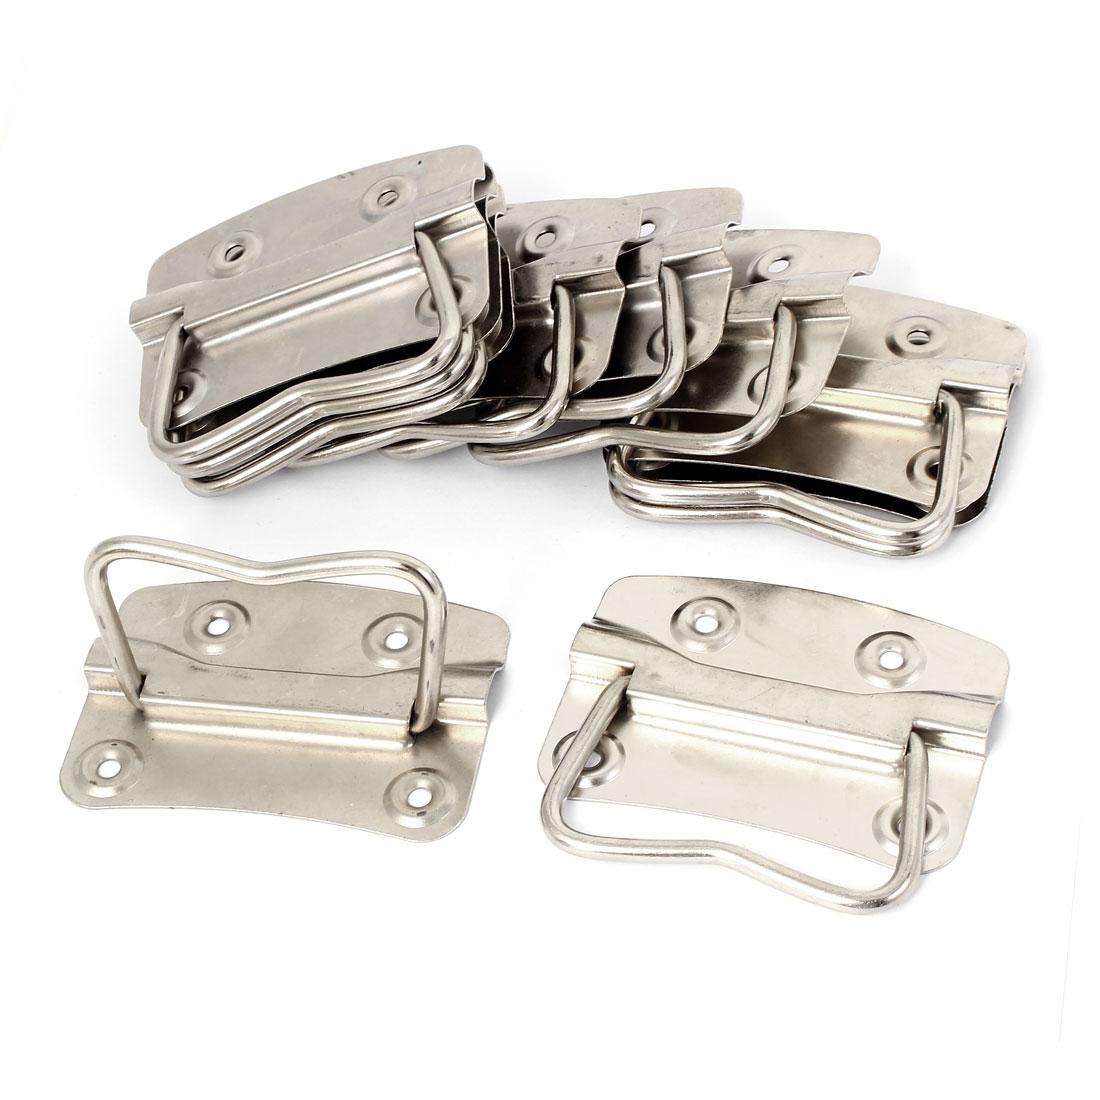 "Metal Flush Mounted Type Box Pulls Tool Chest Trunk Handles 3.5"" Length 10pcs"